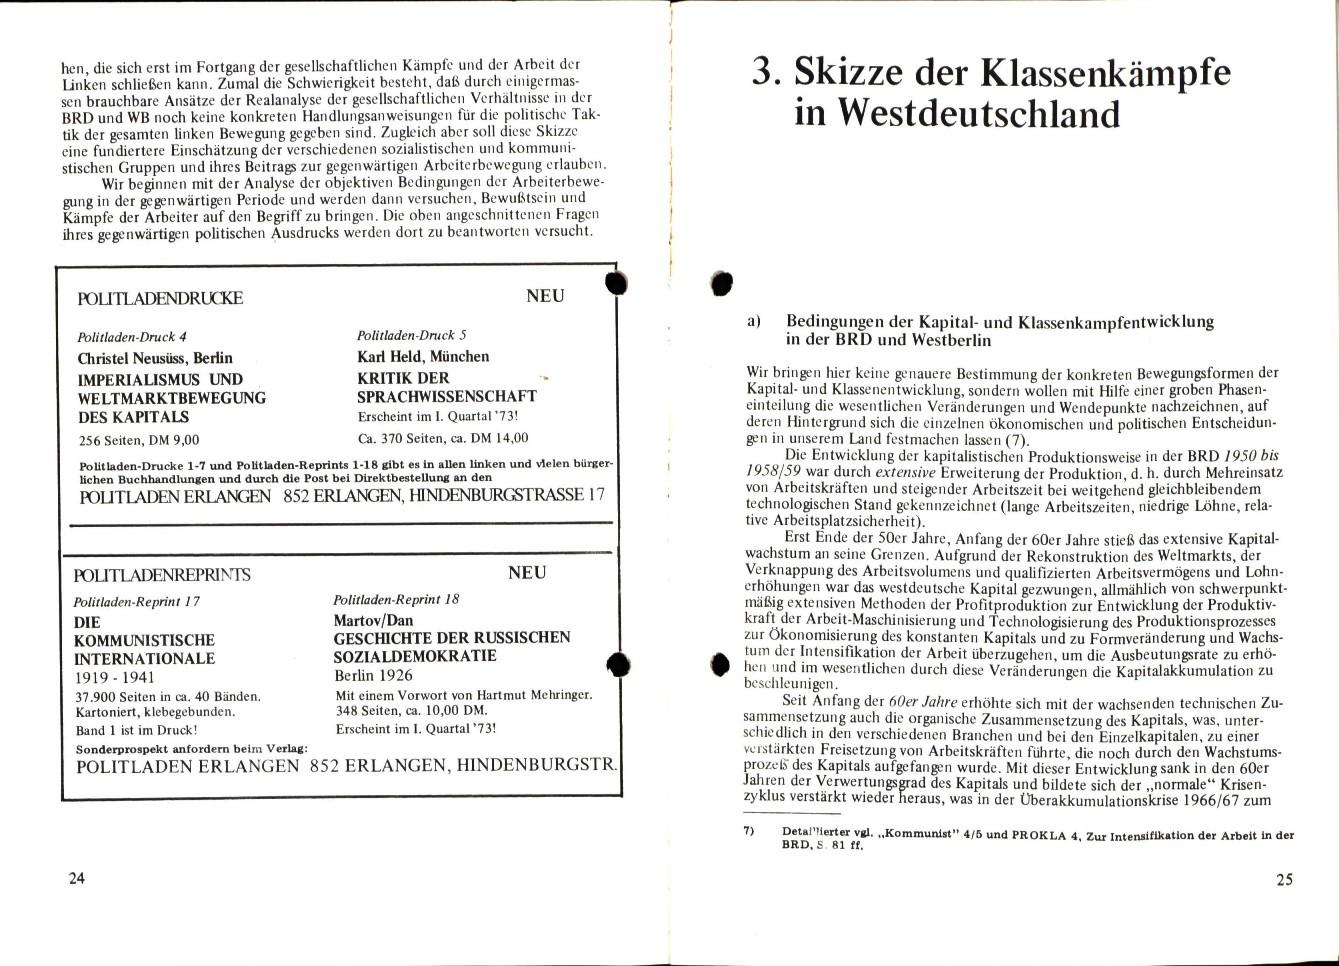 Berlin_KBML_Kommunist_1973_04s_14